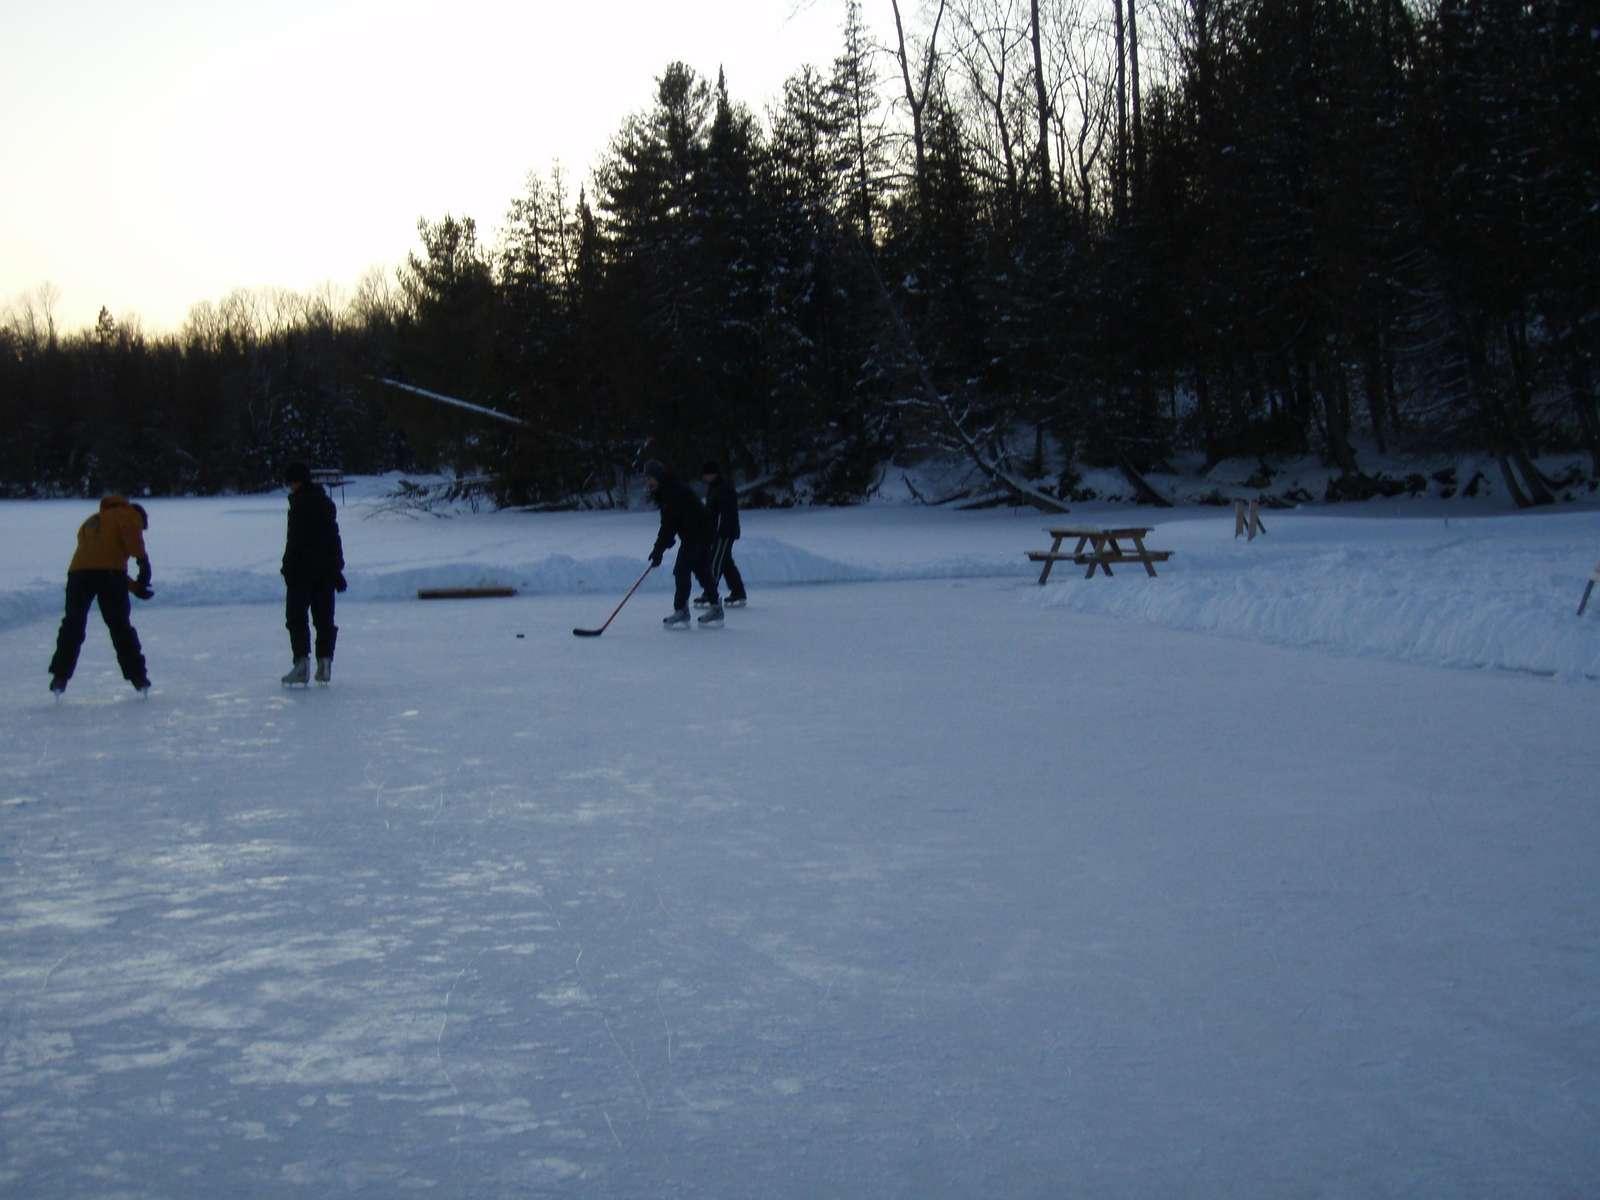 Ice hockey on the lake. So much fun!